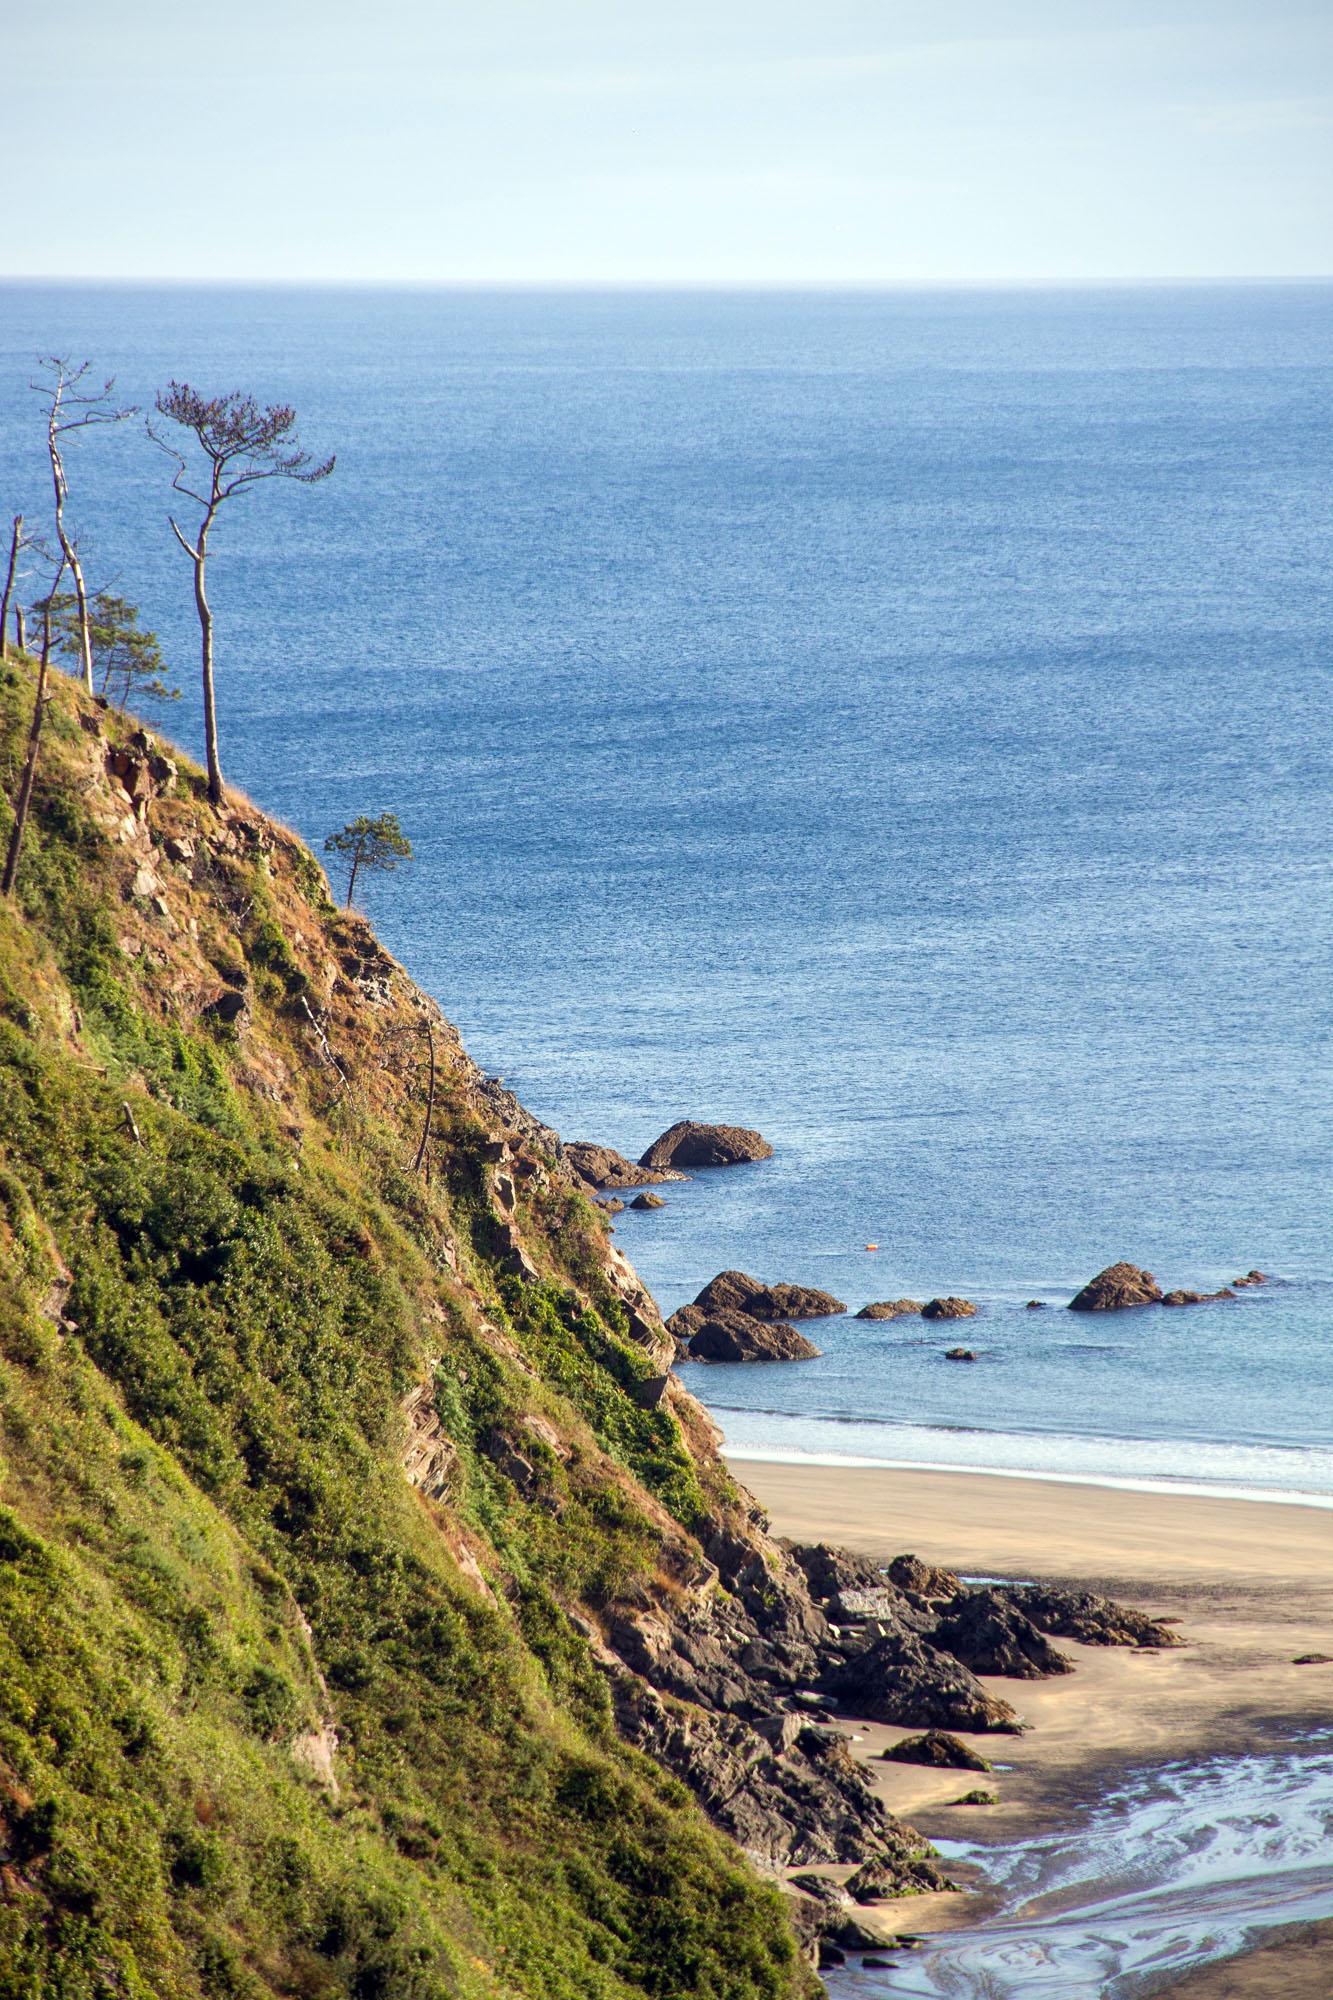 Asturias Cliff Hanger